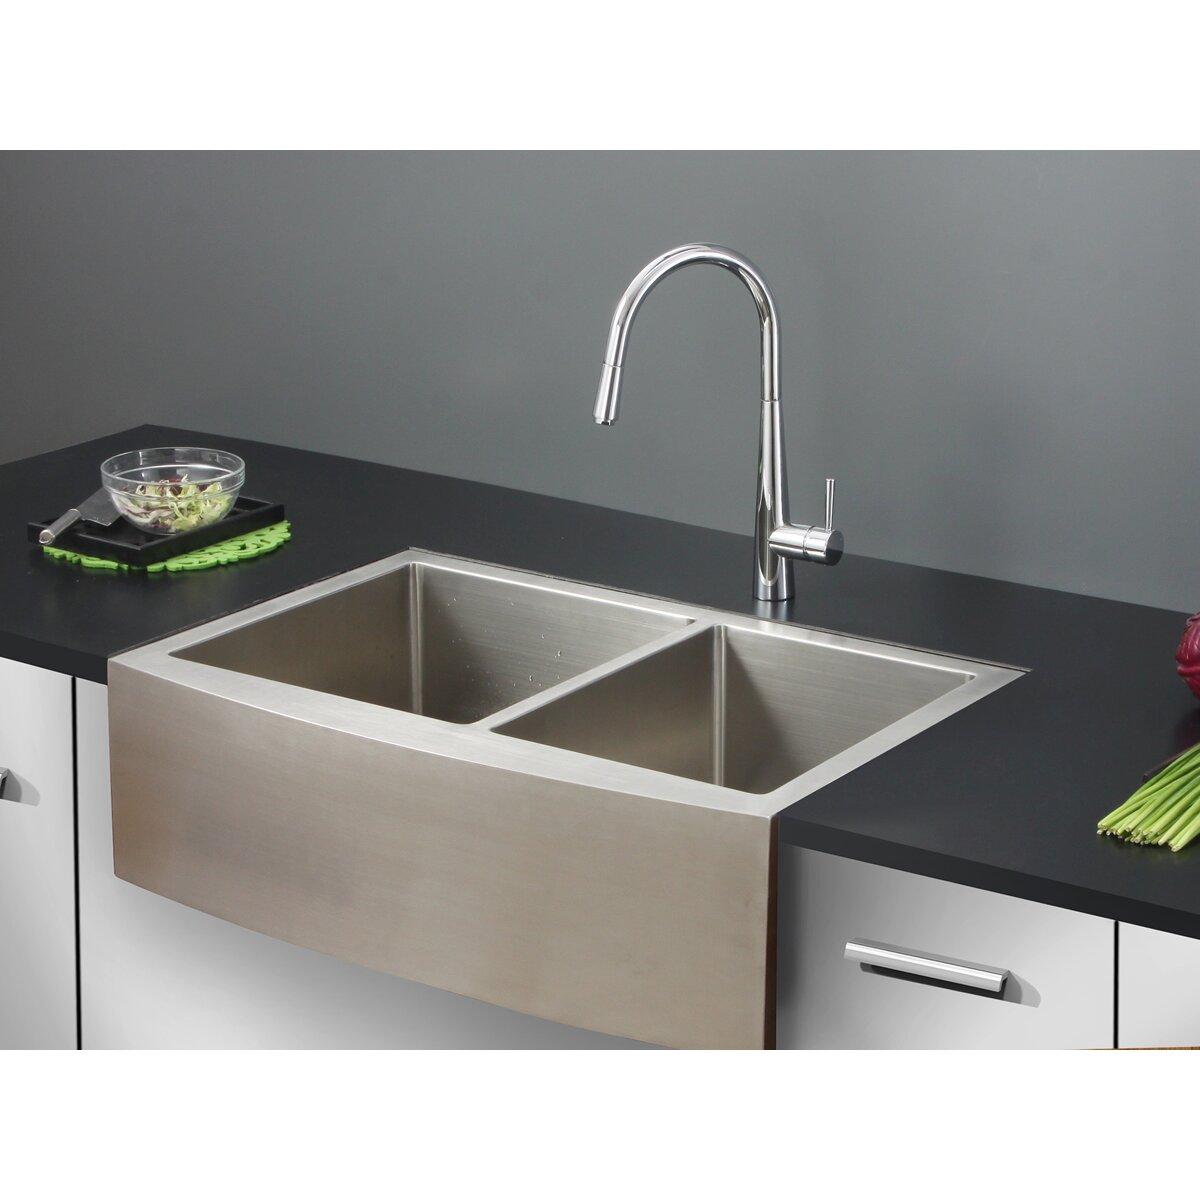 "Apron Kitchen Sink: Ruvati Verona 36"" X 21"" Apron Front Double Bowl Kitchen"